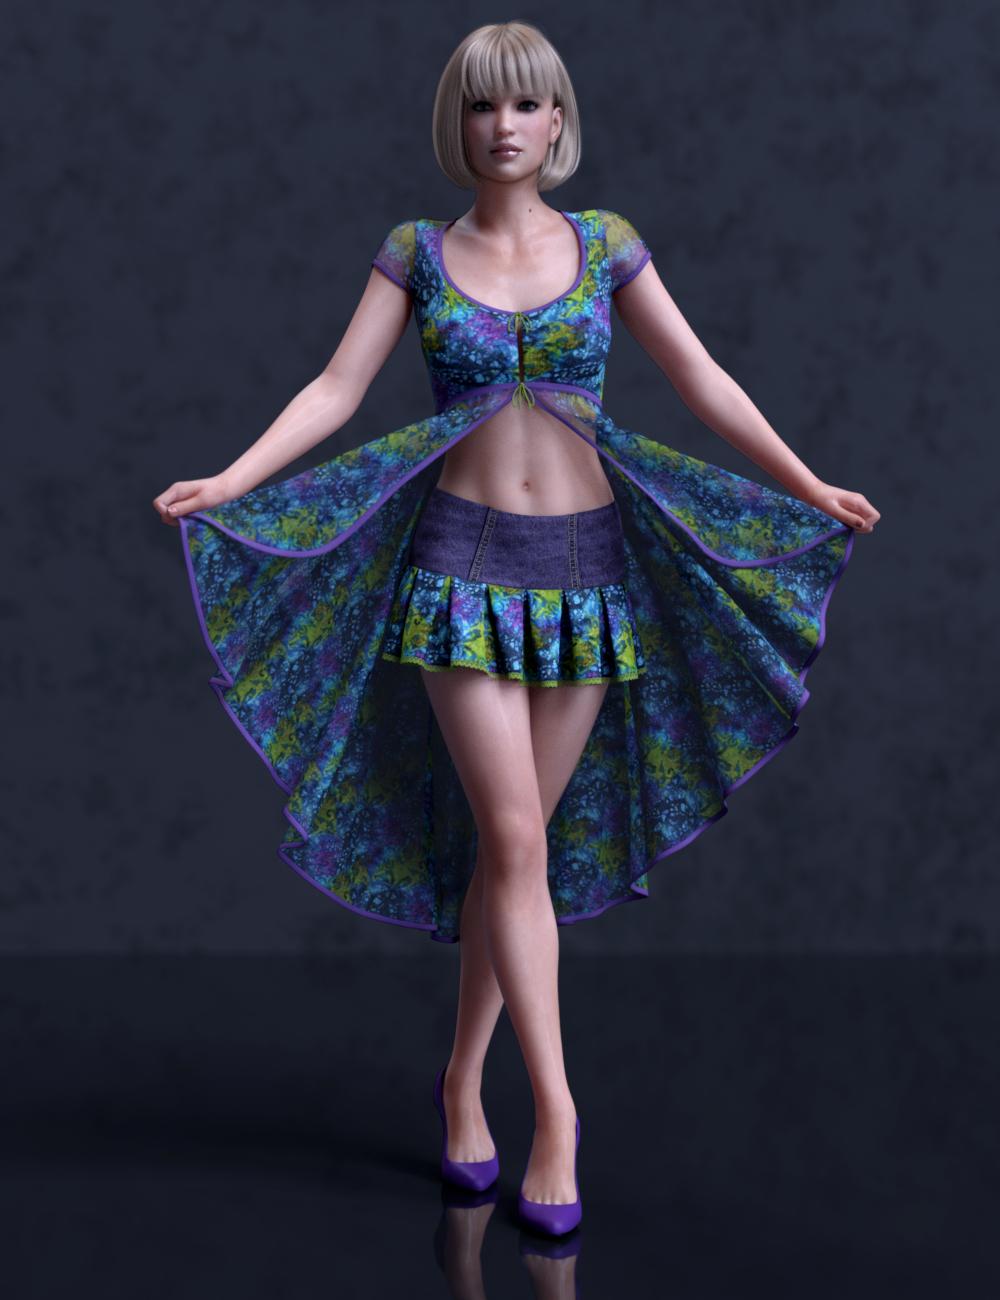 dForce Liberty Grace Outfit Panache Textures by: Leviathan, 3D Models by Daz 3D